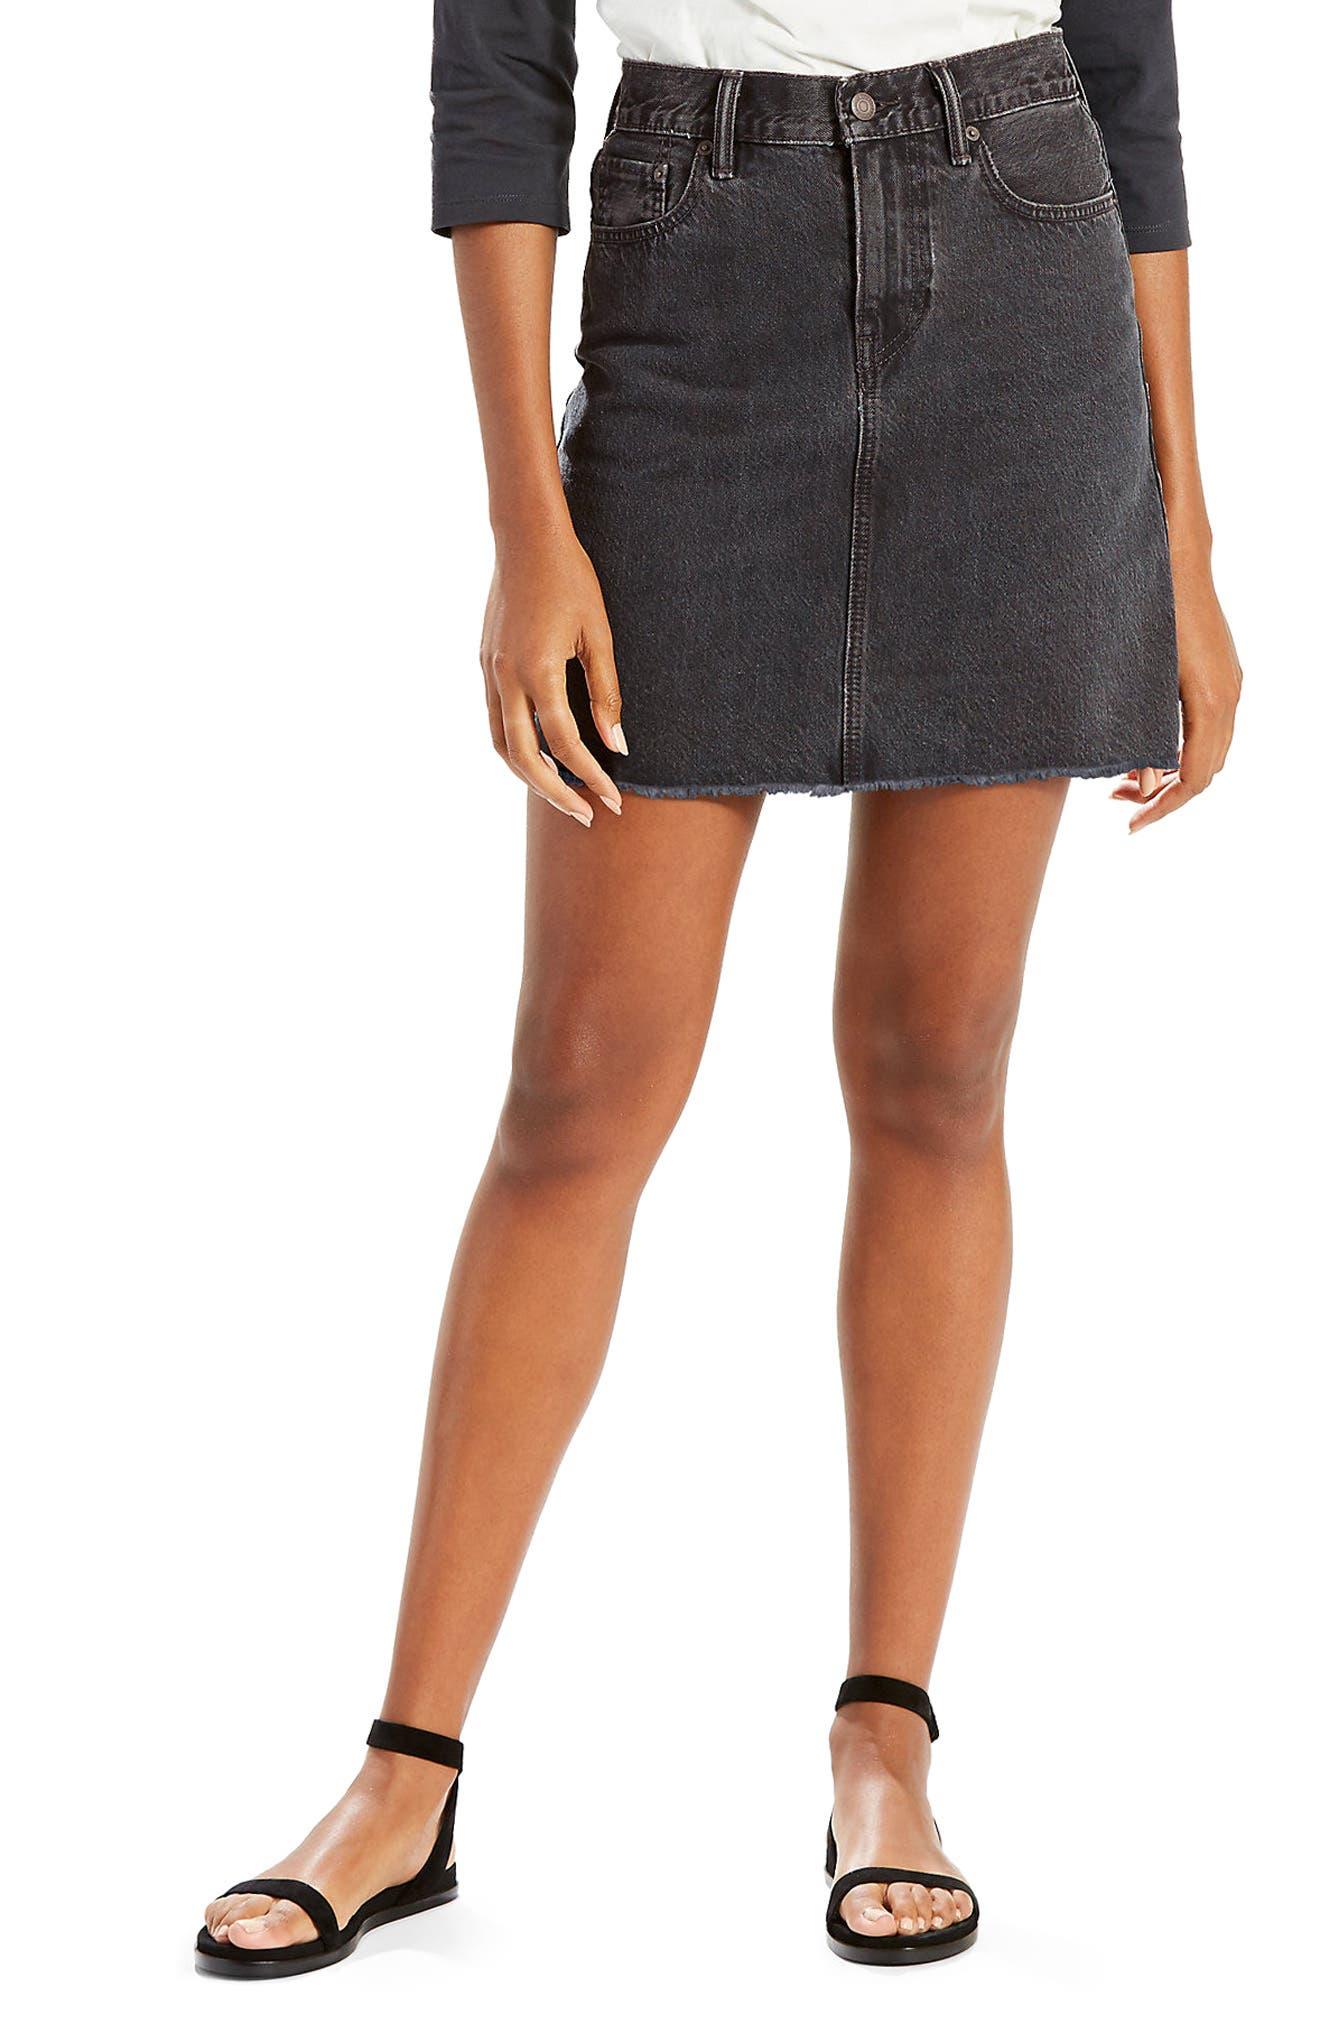 Everyday Denim Skirt,                             Main thumbnail 1, color,                             Mixed Tape Washed Black Denim